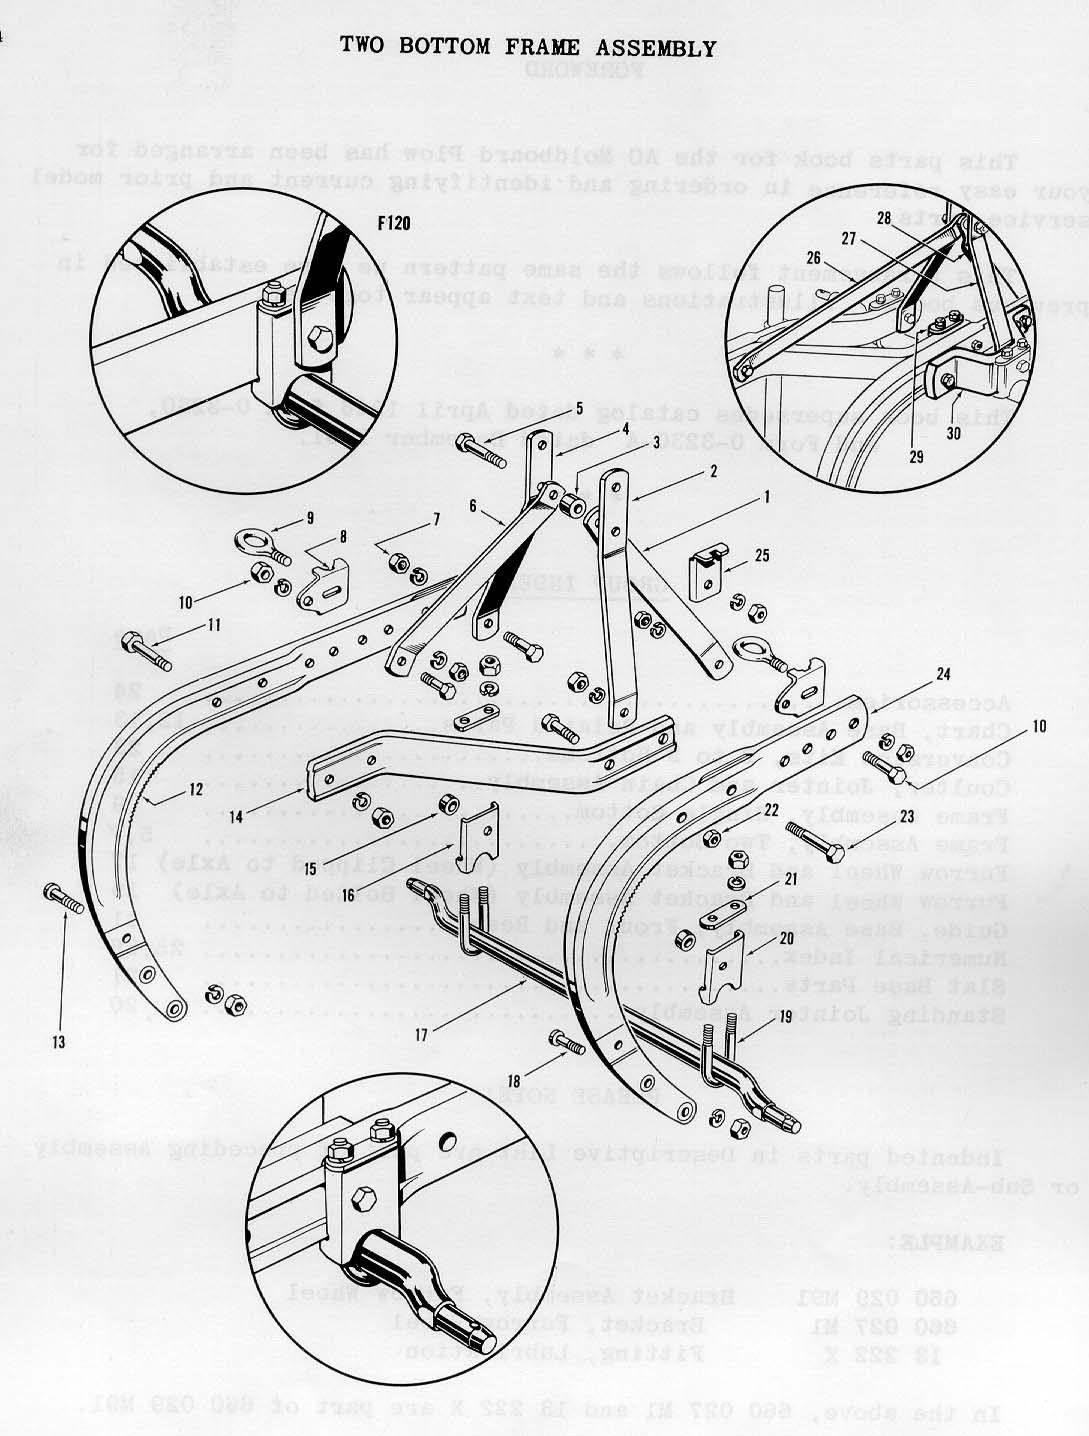 ferguson ao mouldboard plows parts book rh ntractorclub com  Brush Hog Manual